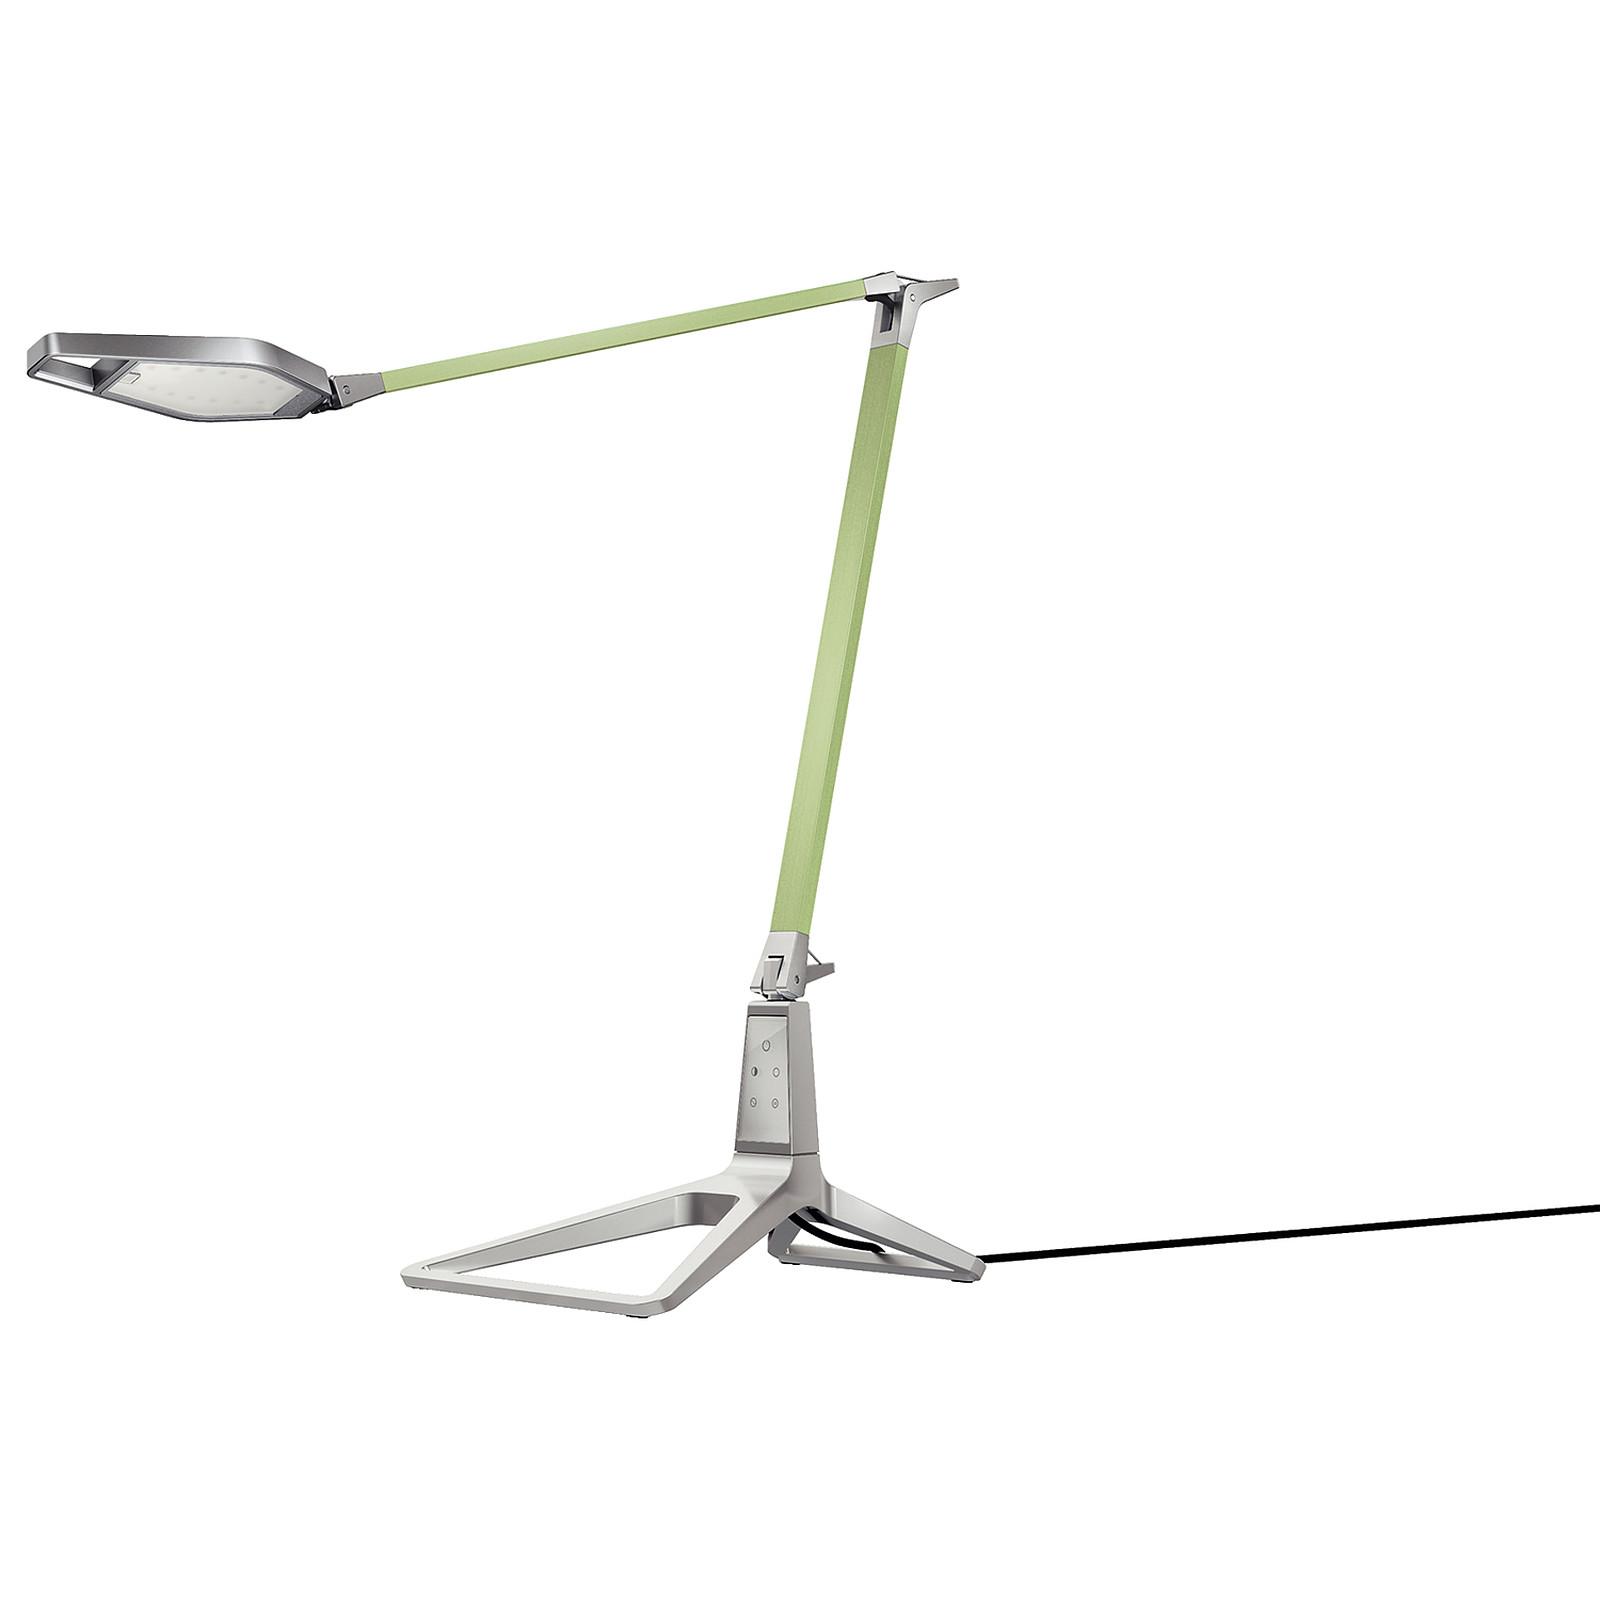 Leitz Style Lampe de bureau intelligente LED Verte